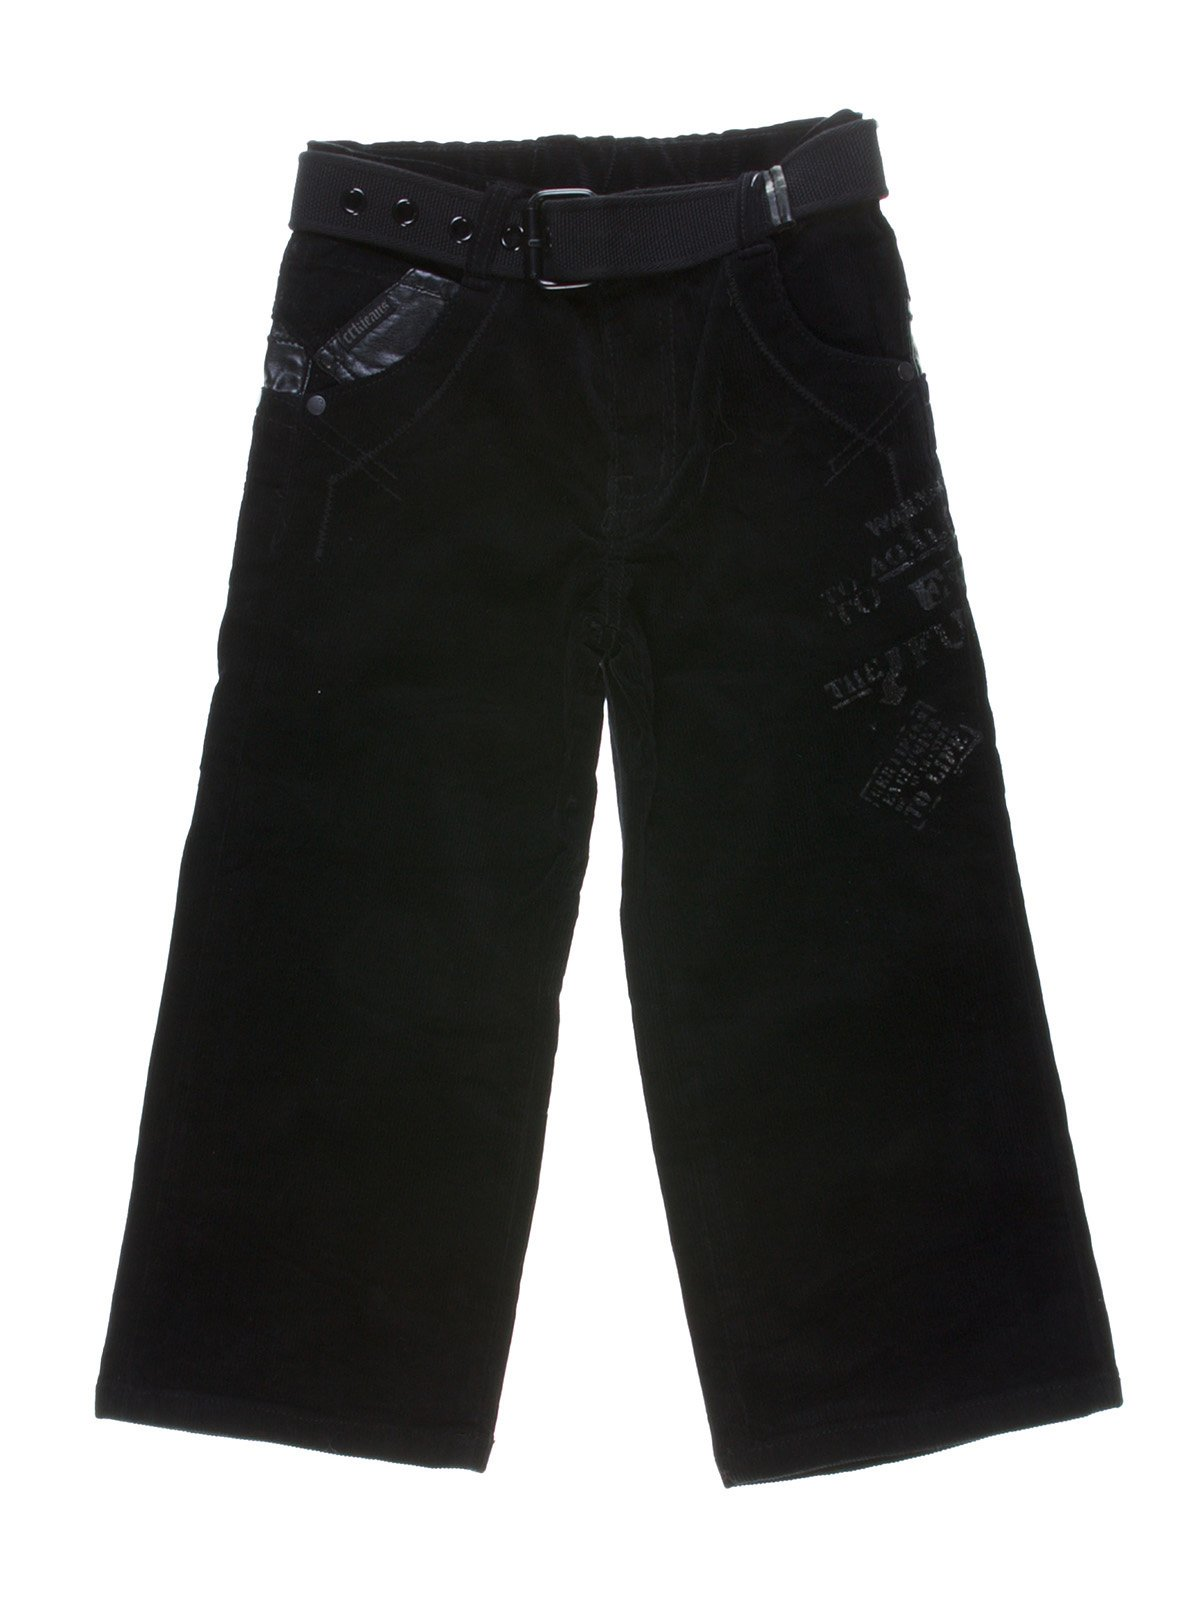 Штани чорні з написами | 1269850